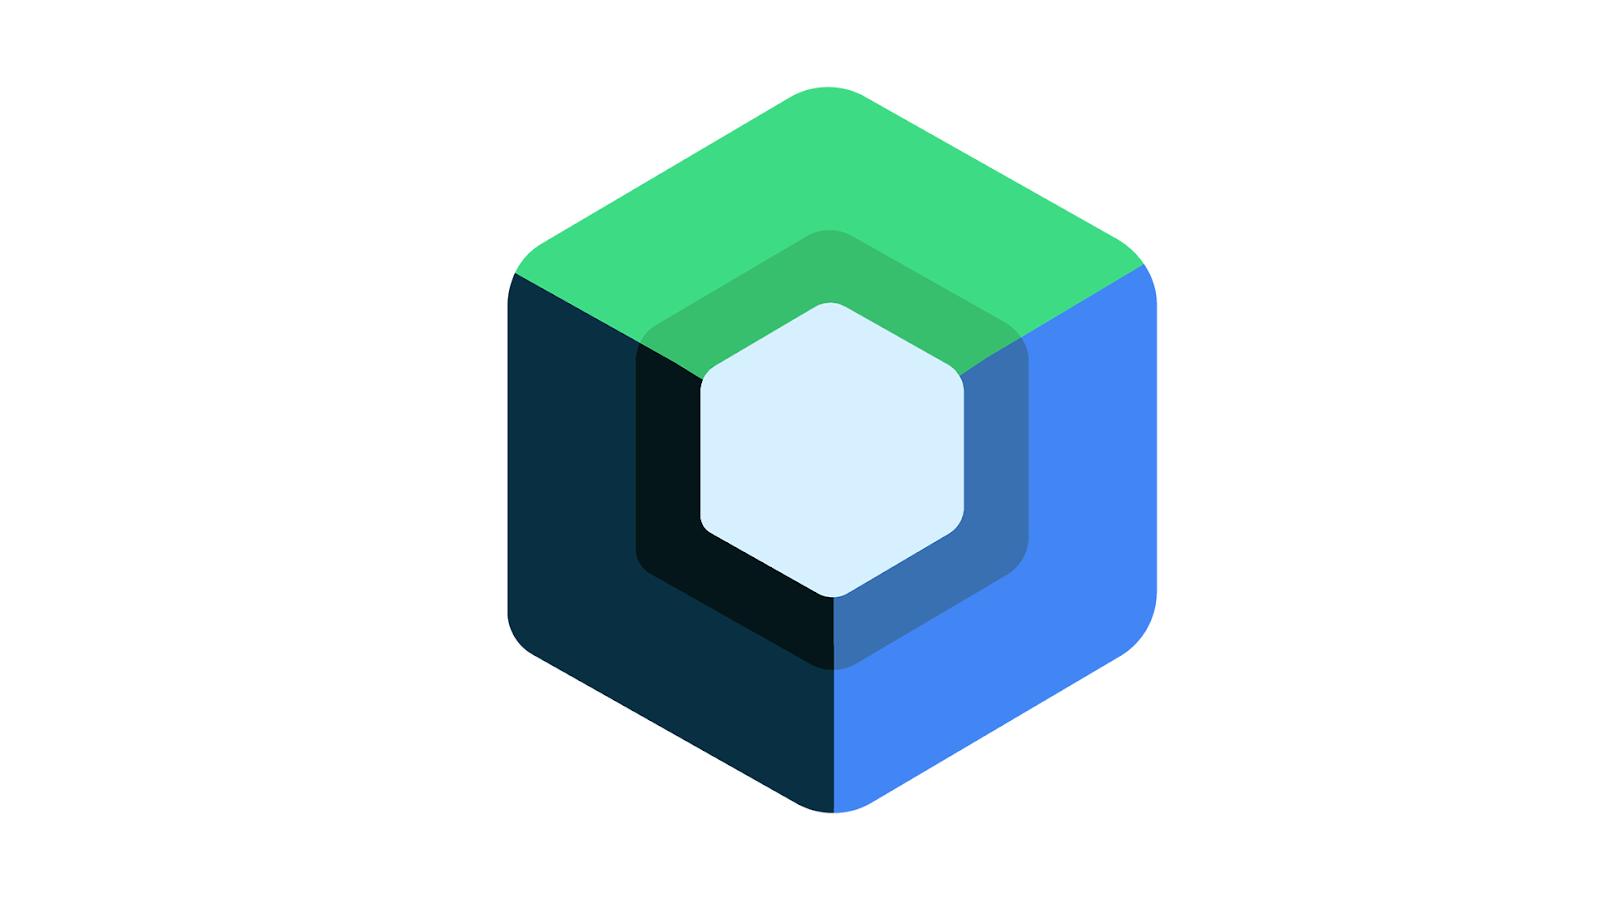 Logo Jetpack Compose